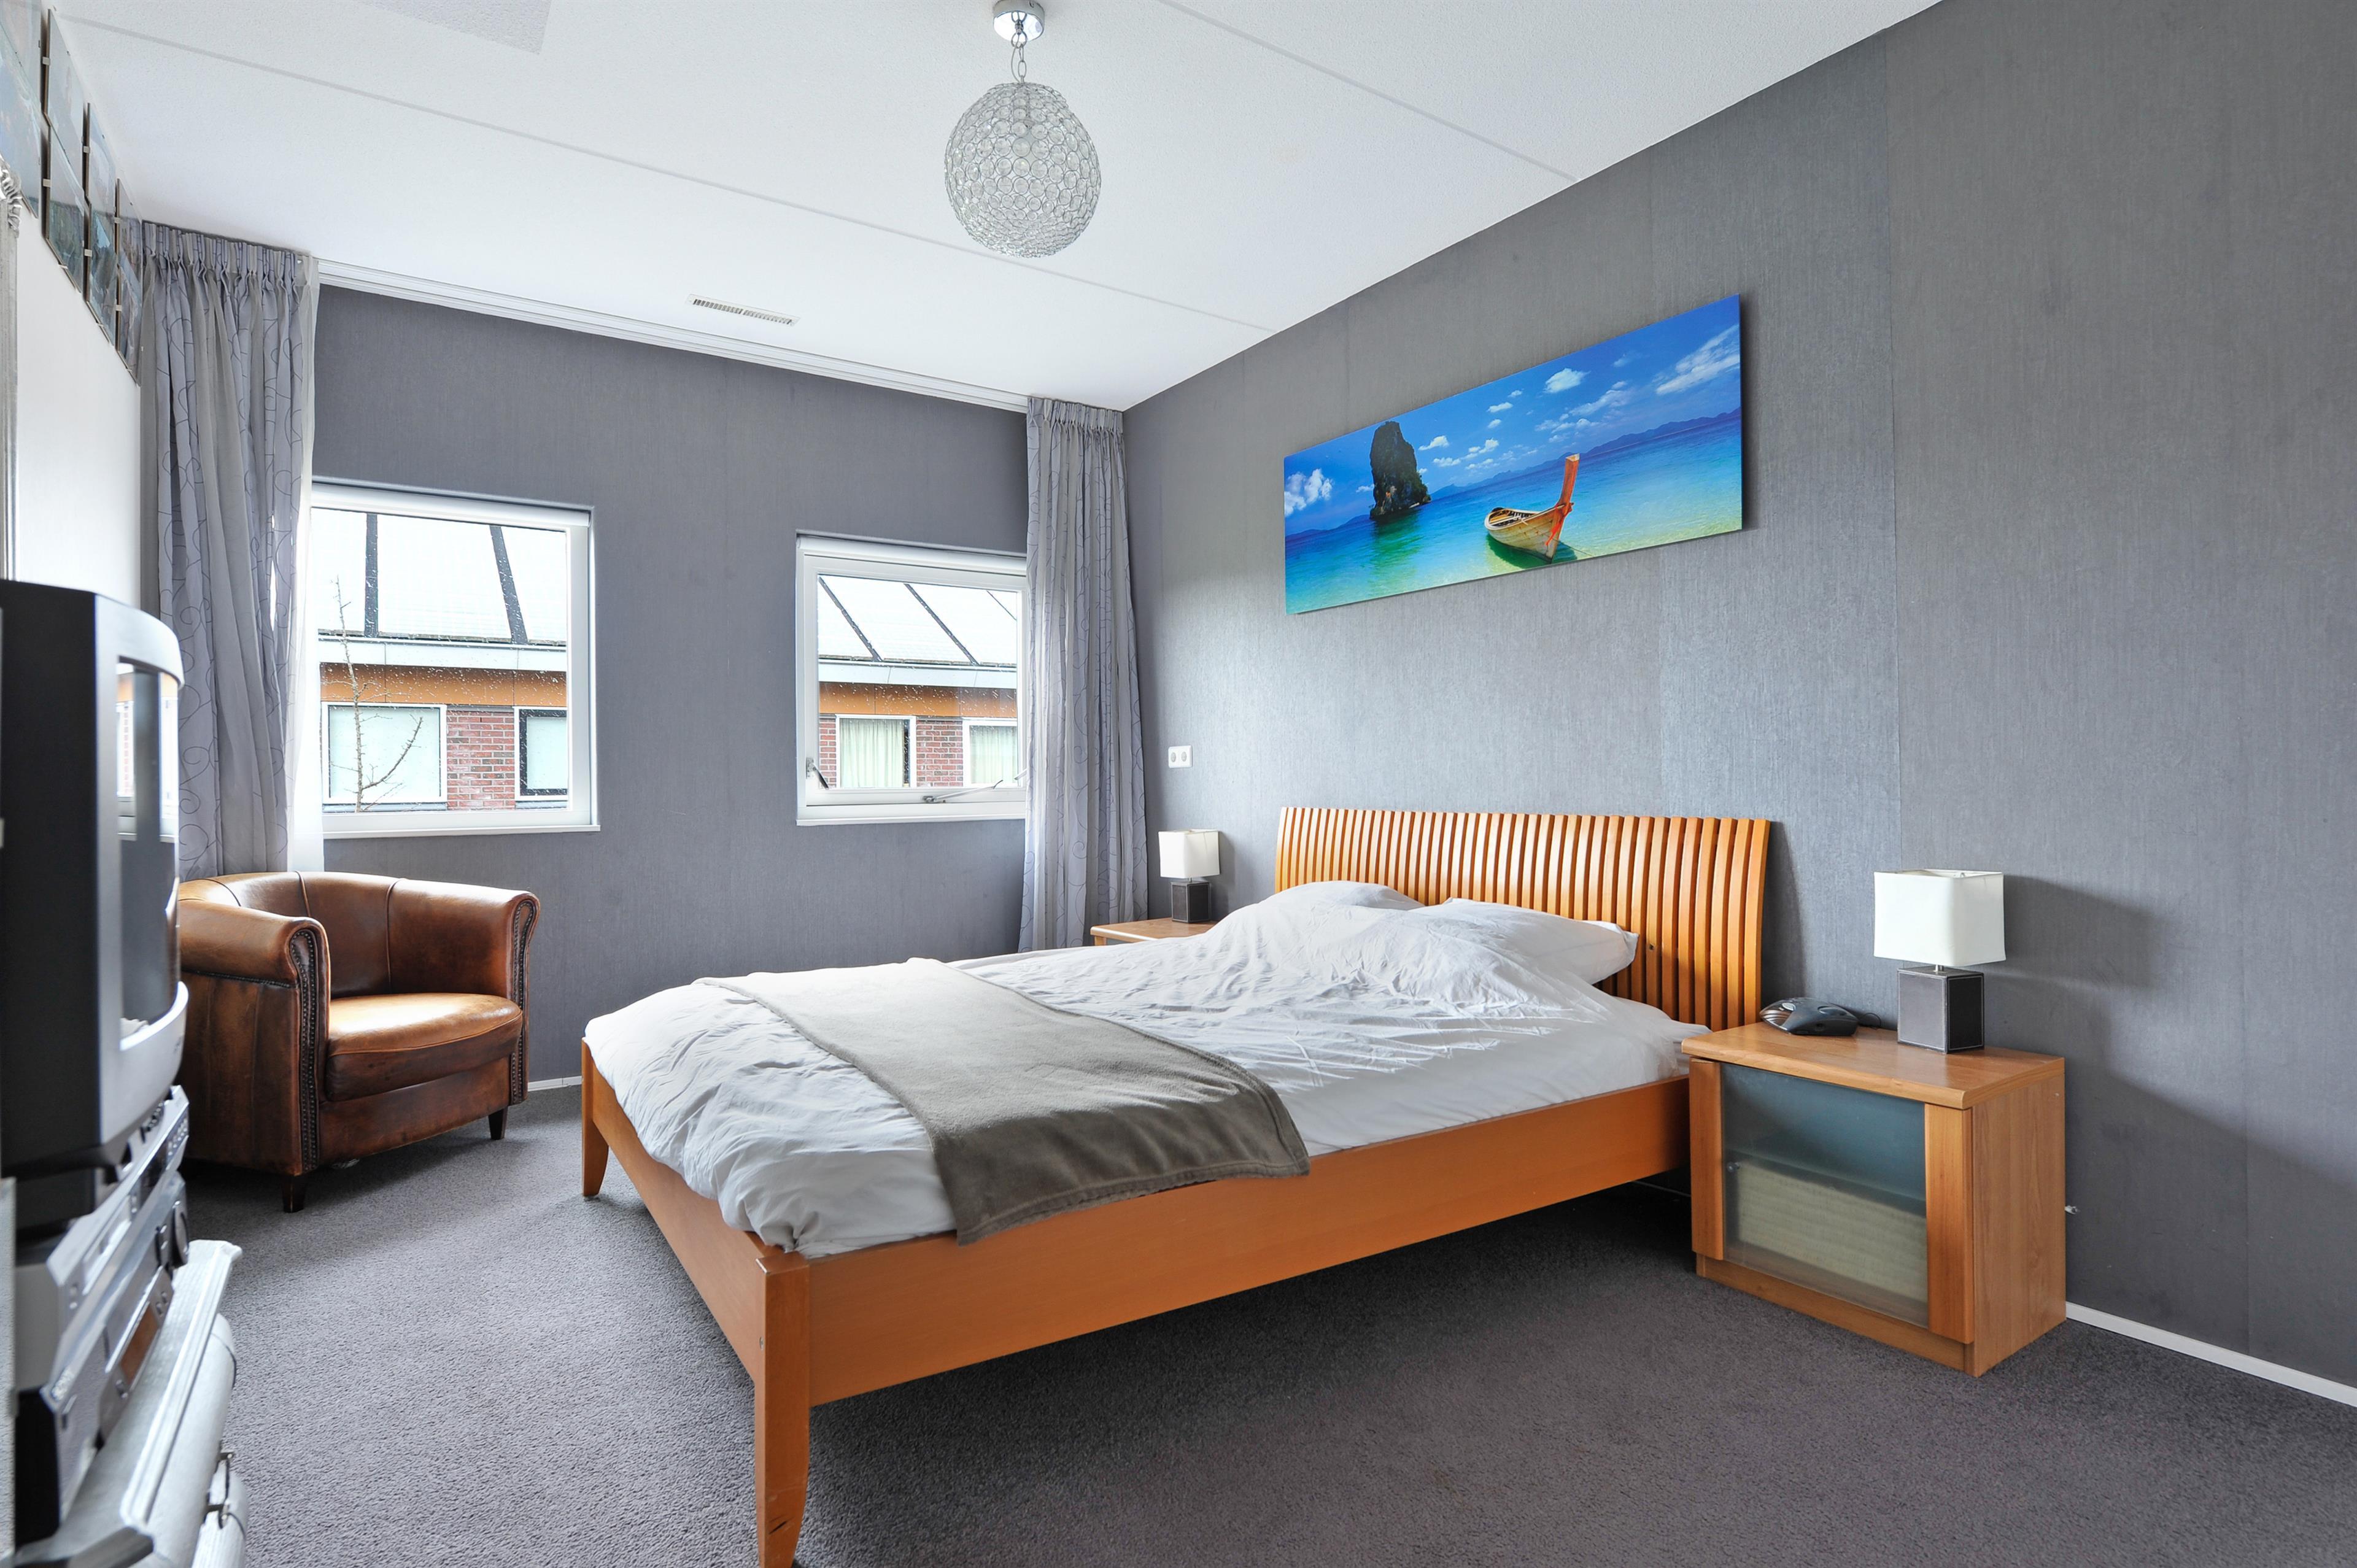 slaapkamer meubels alkmaar ~ lactate for ., Deco ideeën